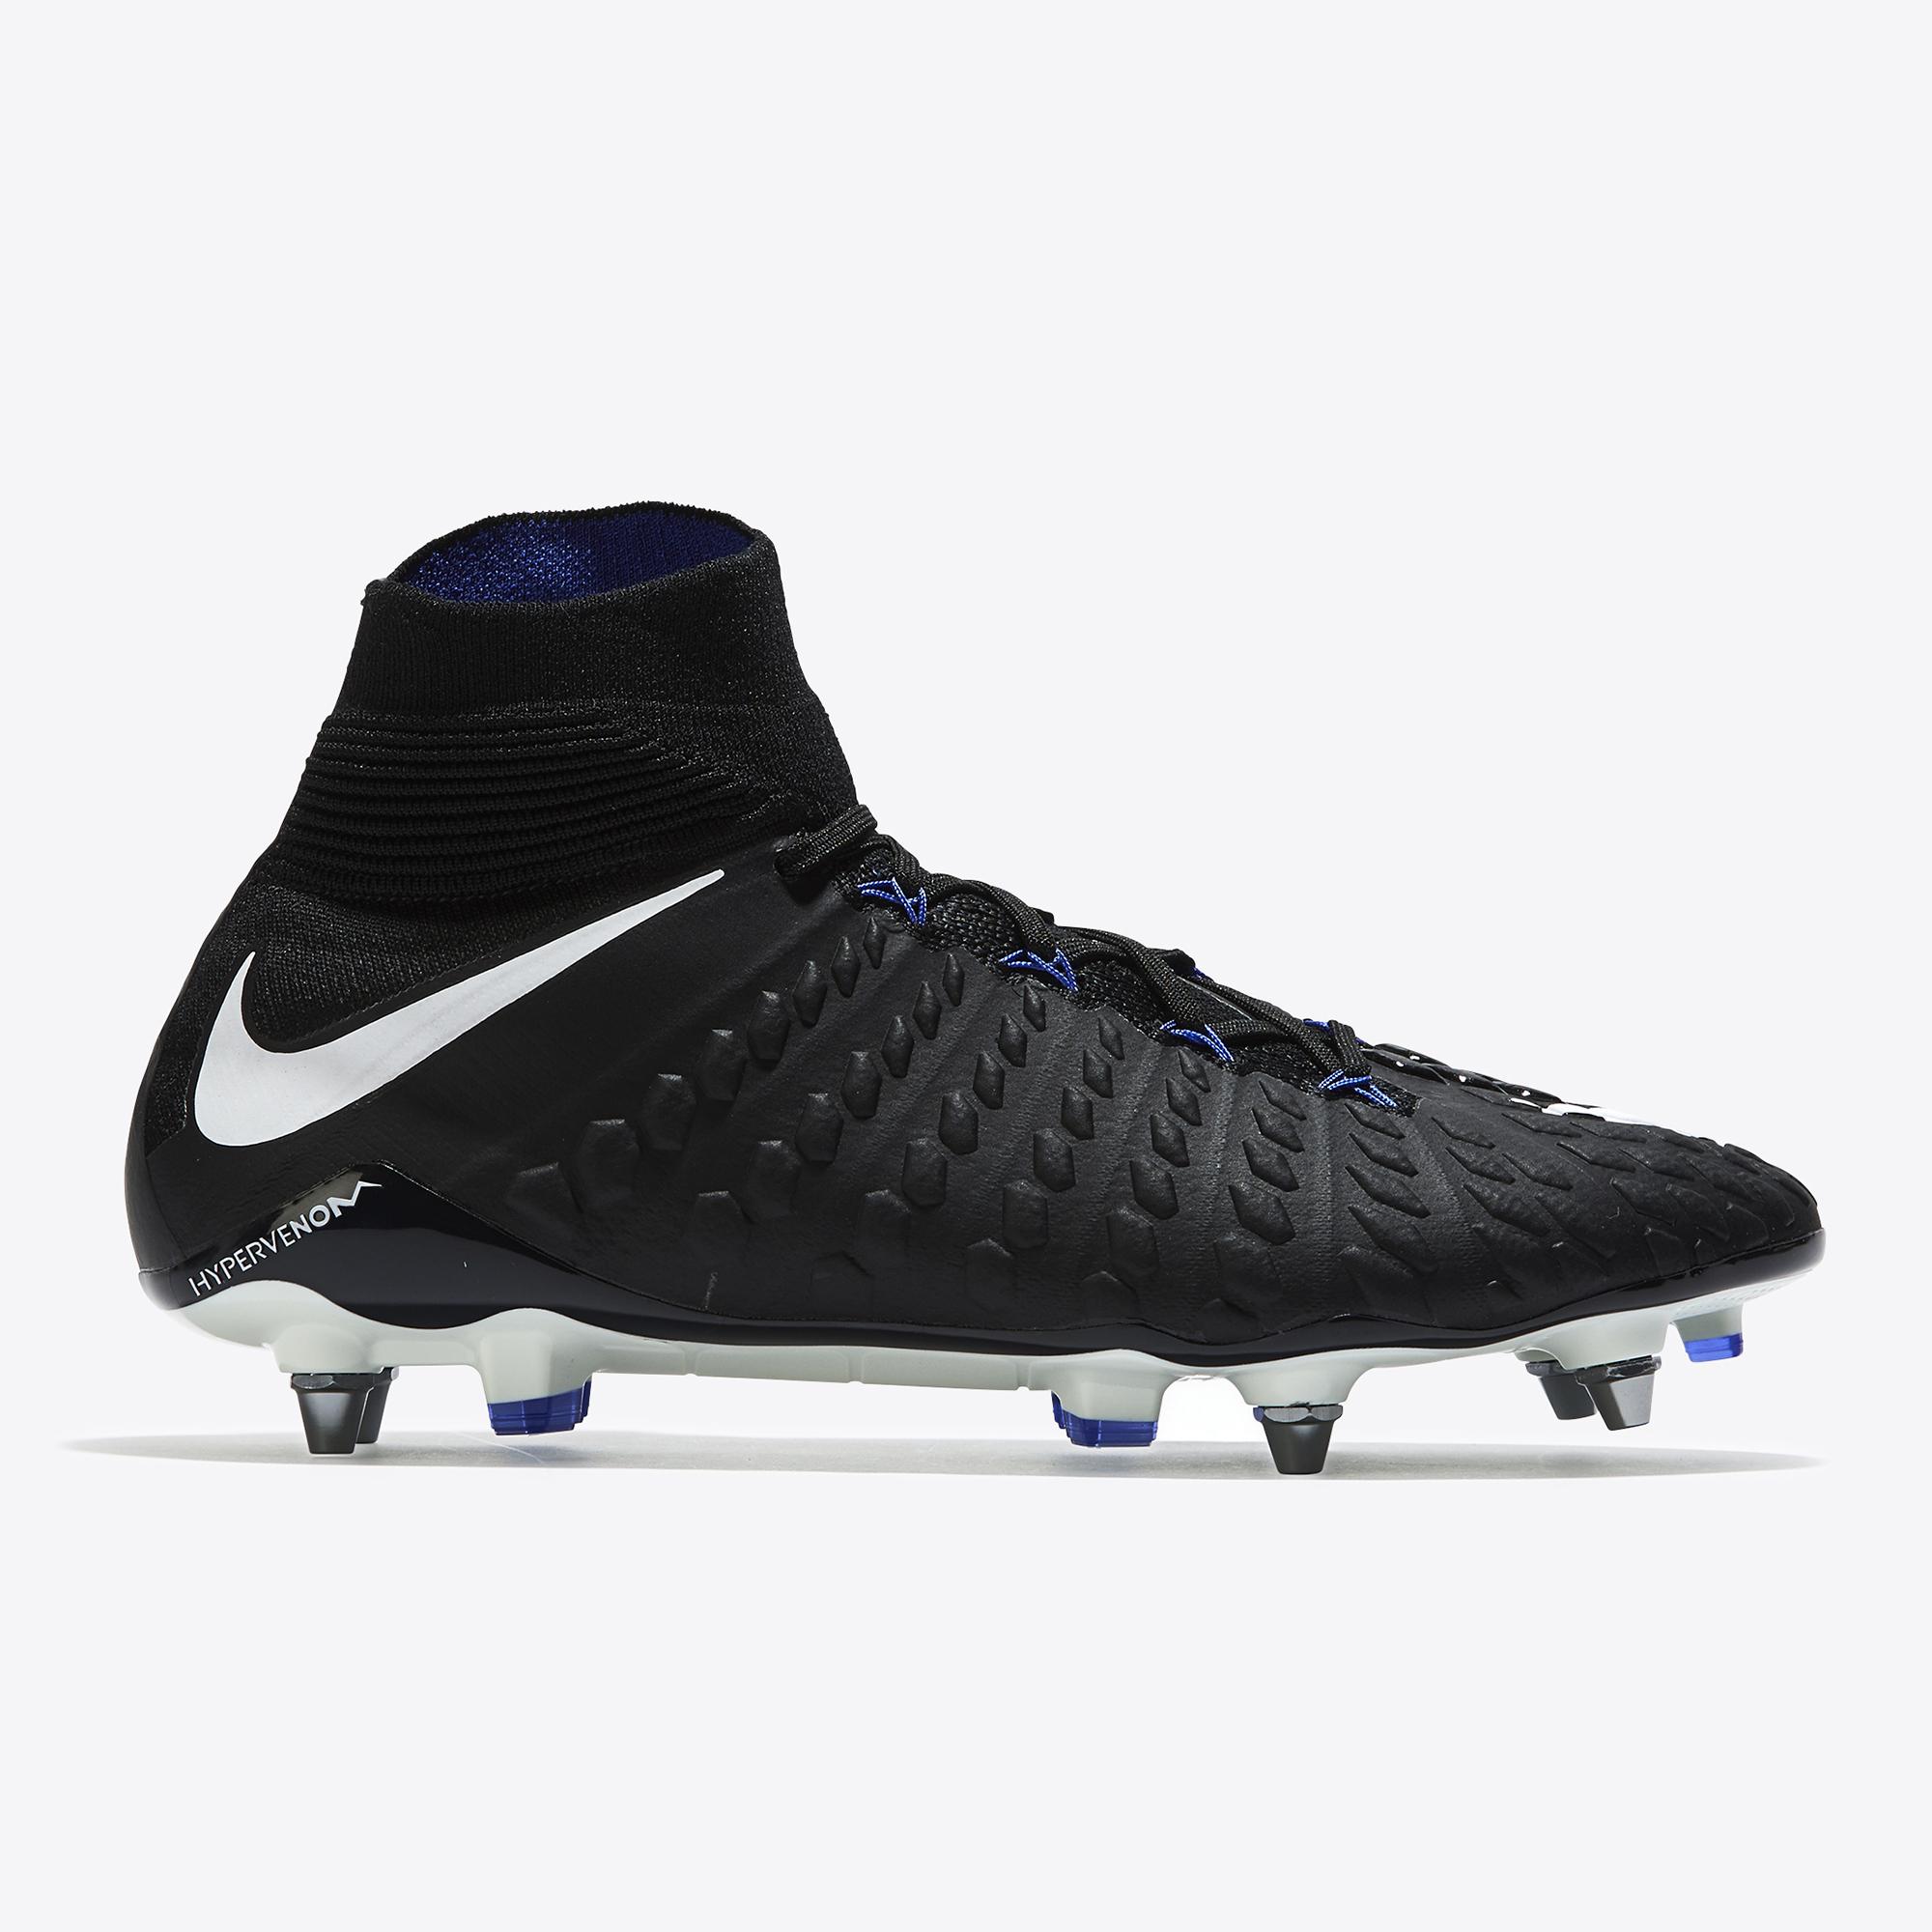 Nike Hypervenom Phantom III Dynamic Fit Soft Ground Pro Football Boots